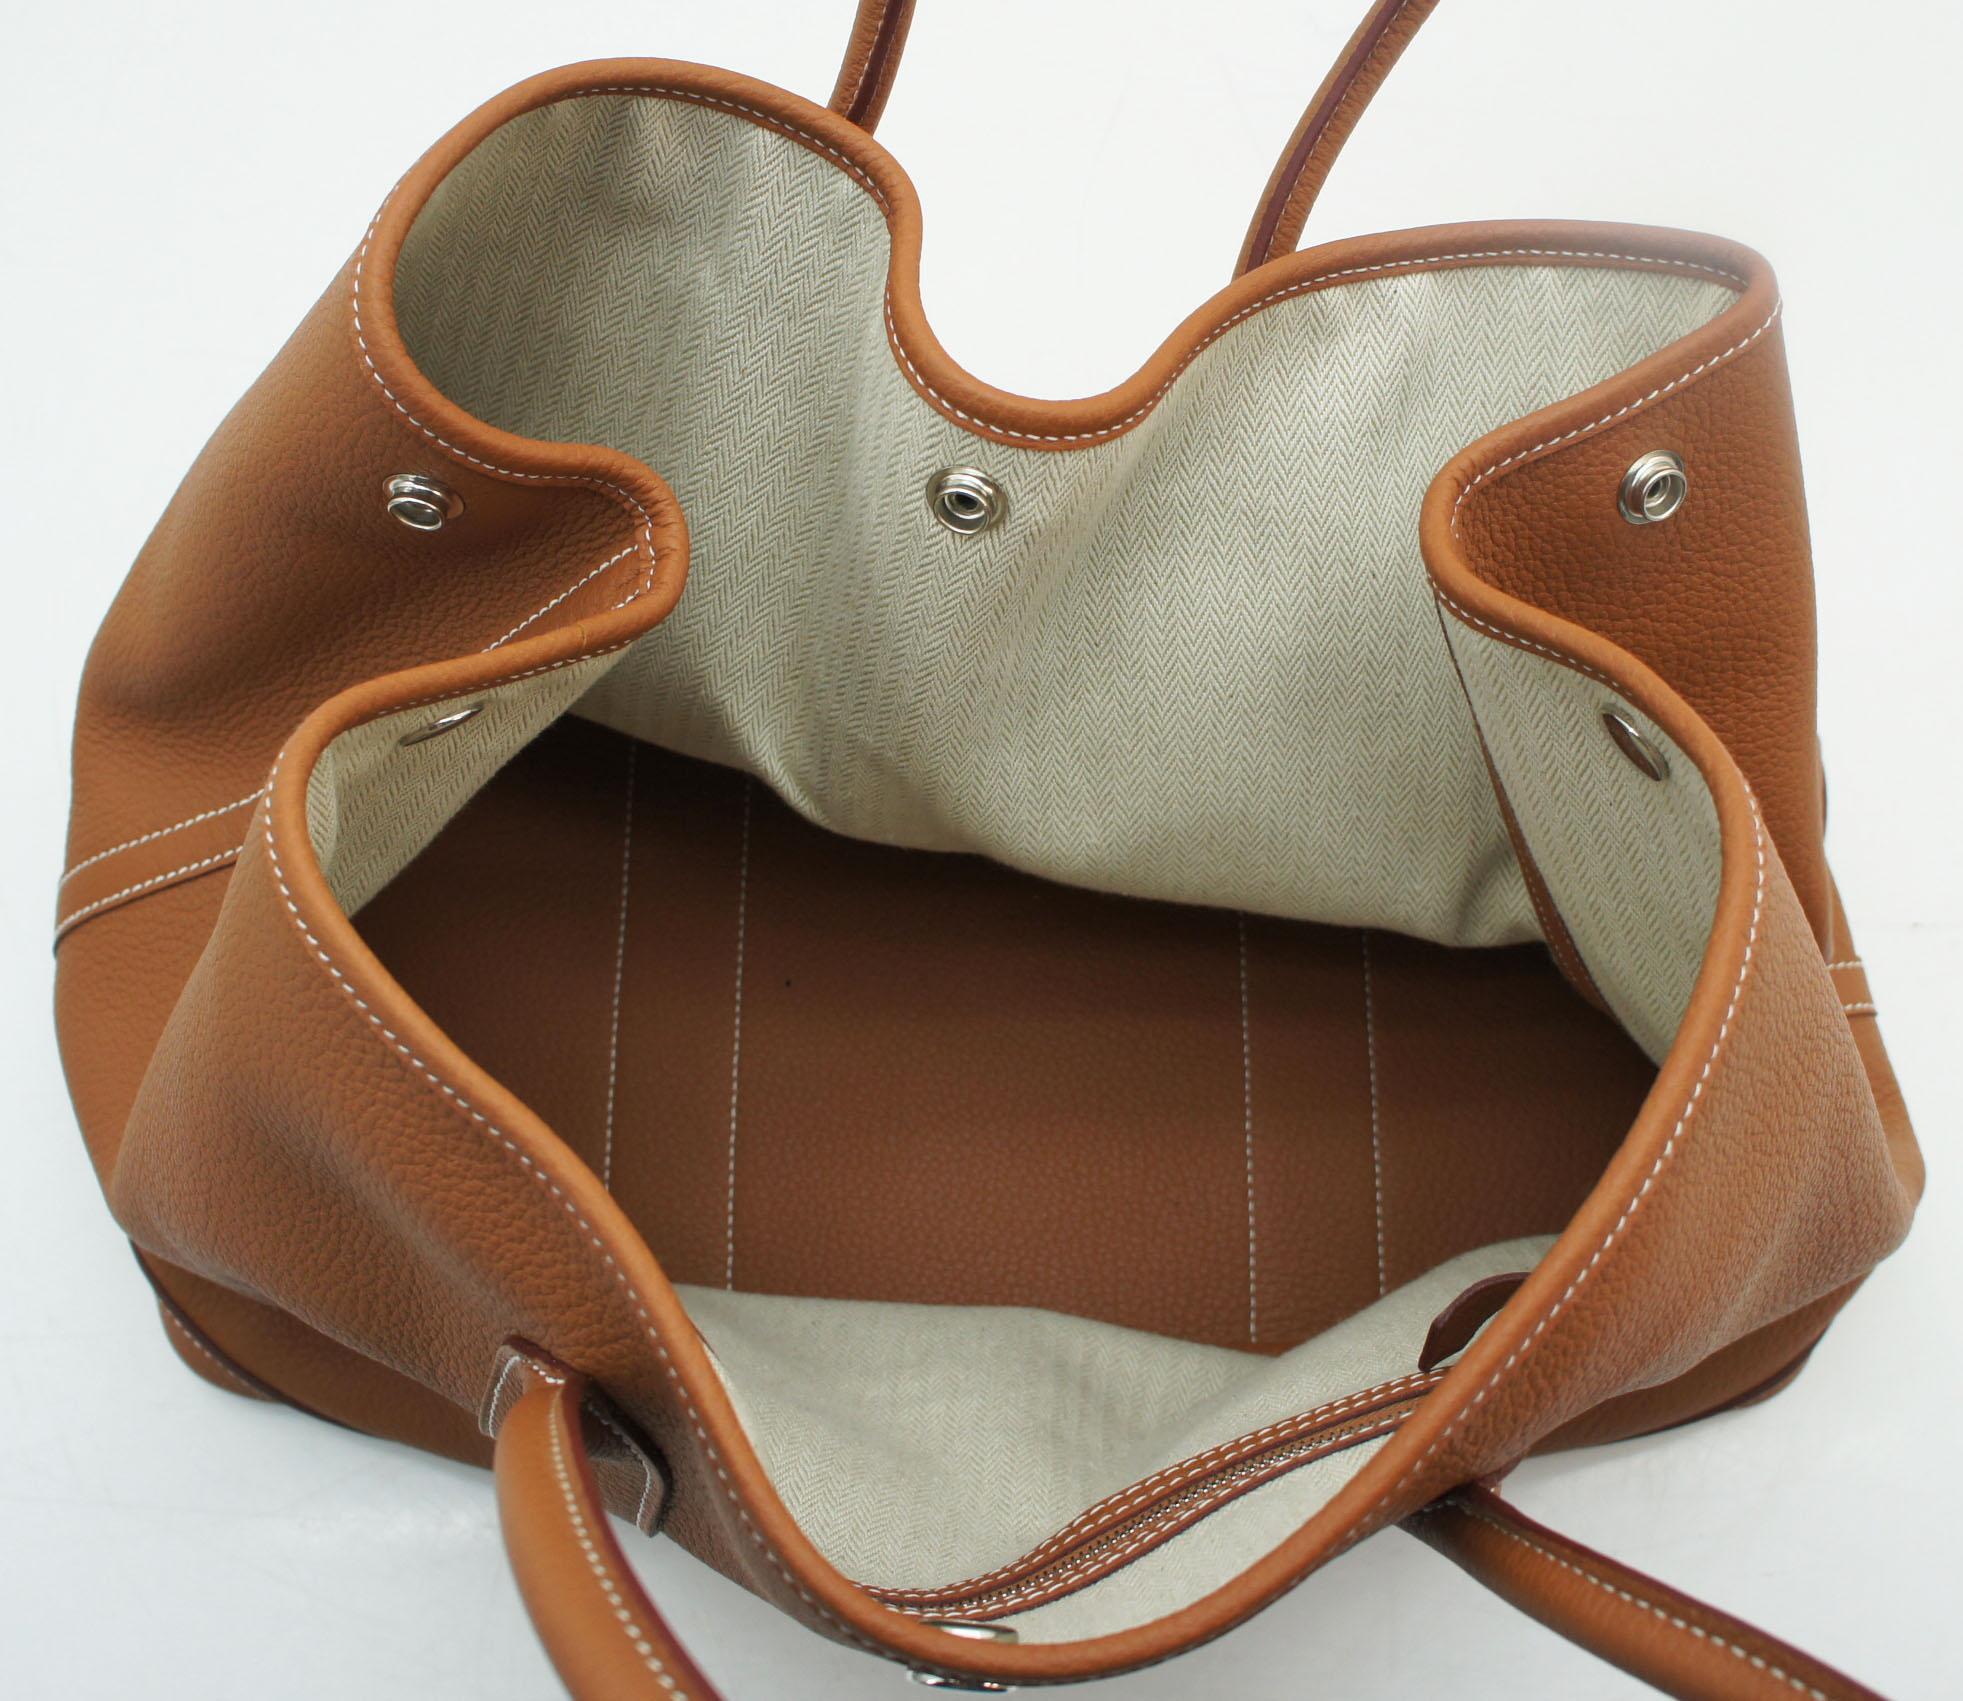 Hermes Taschen Merkmale